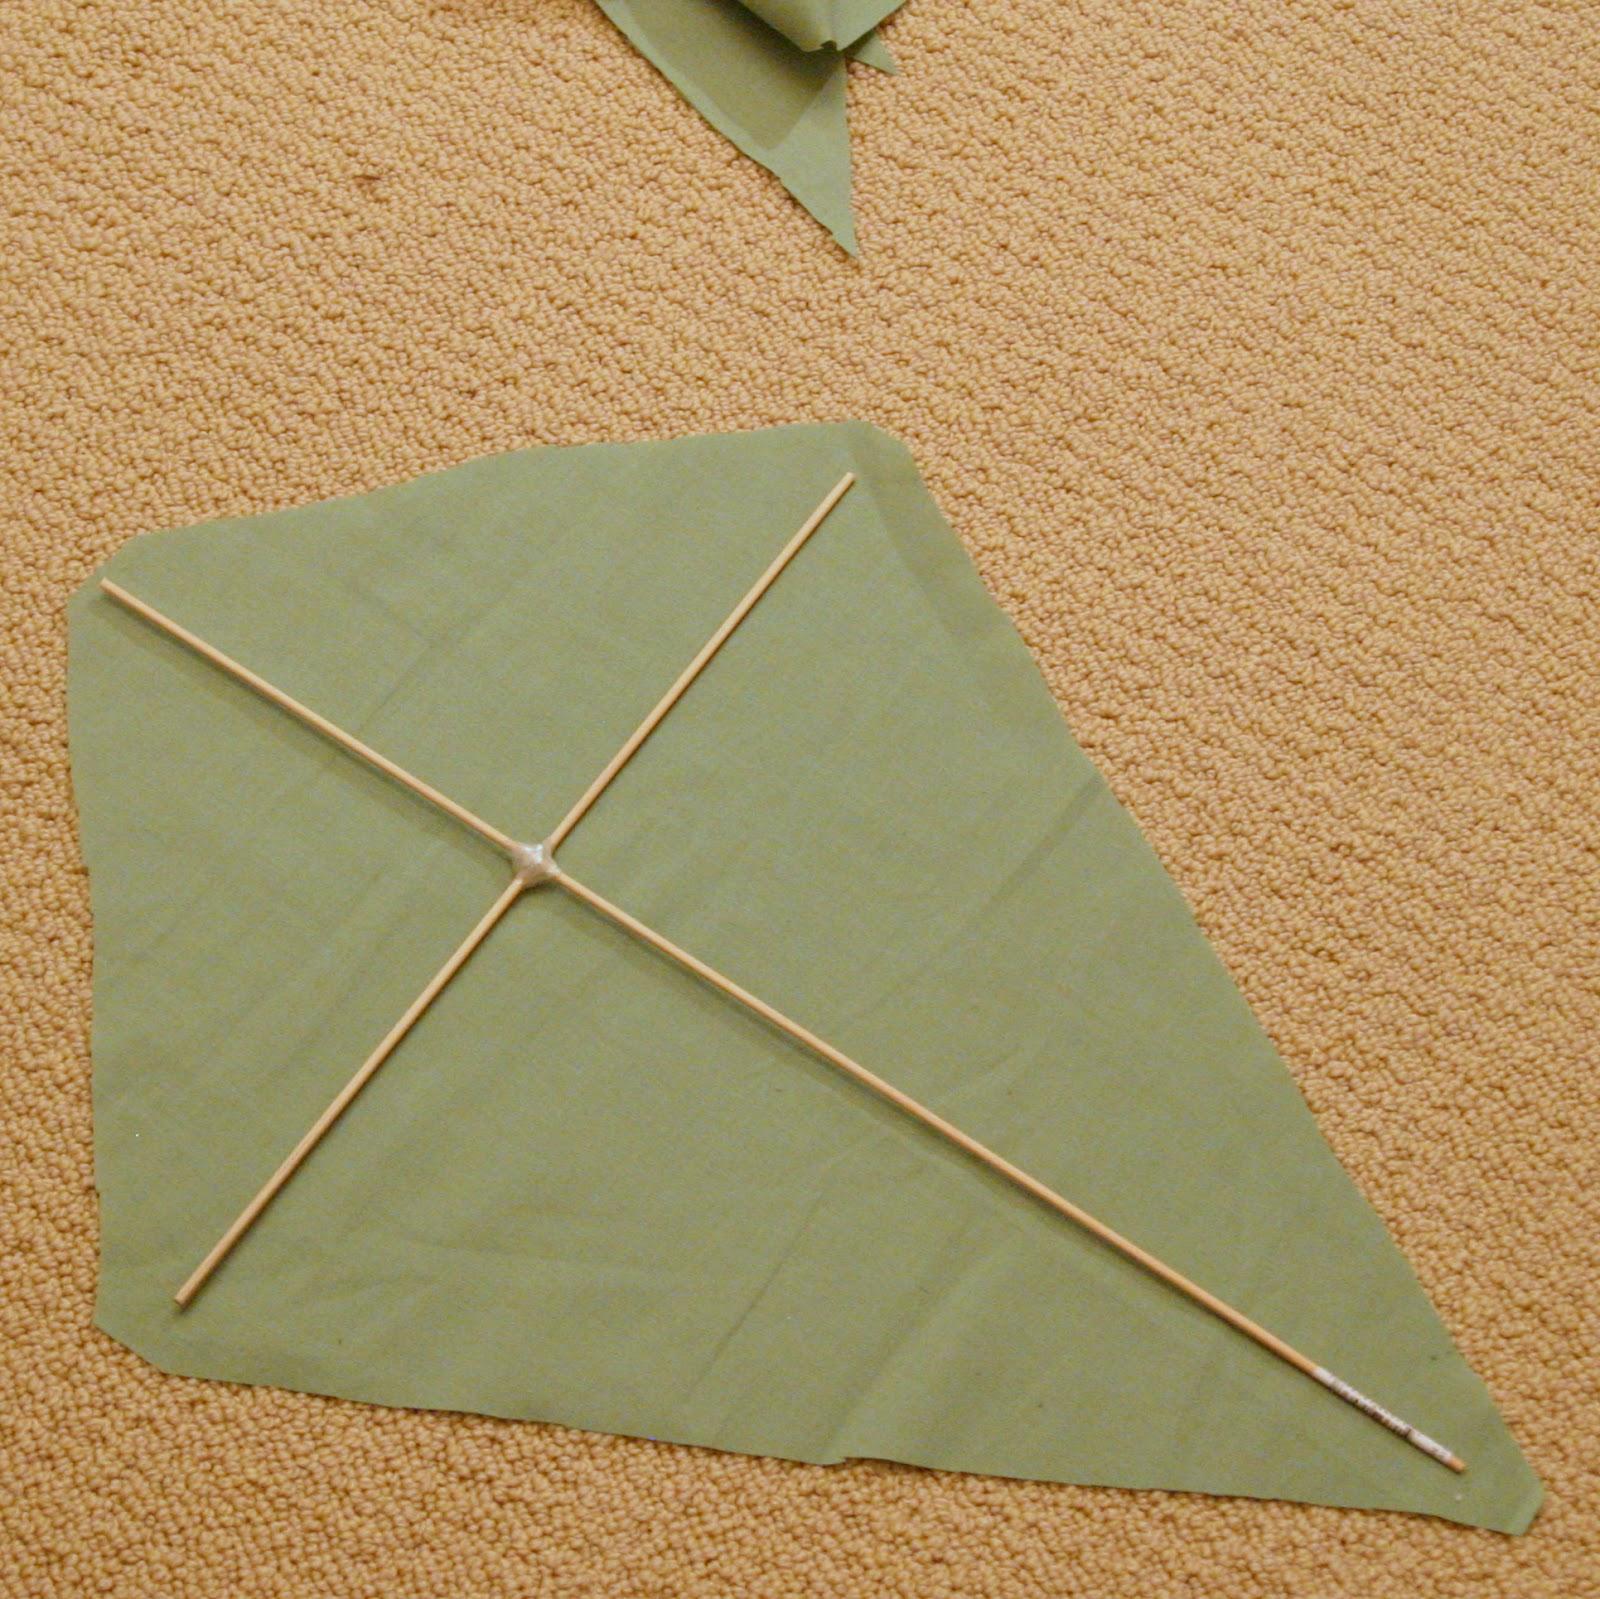 how to make a decorative kite